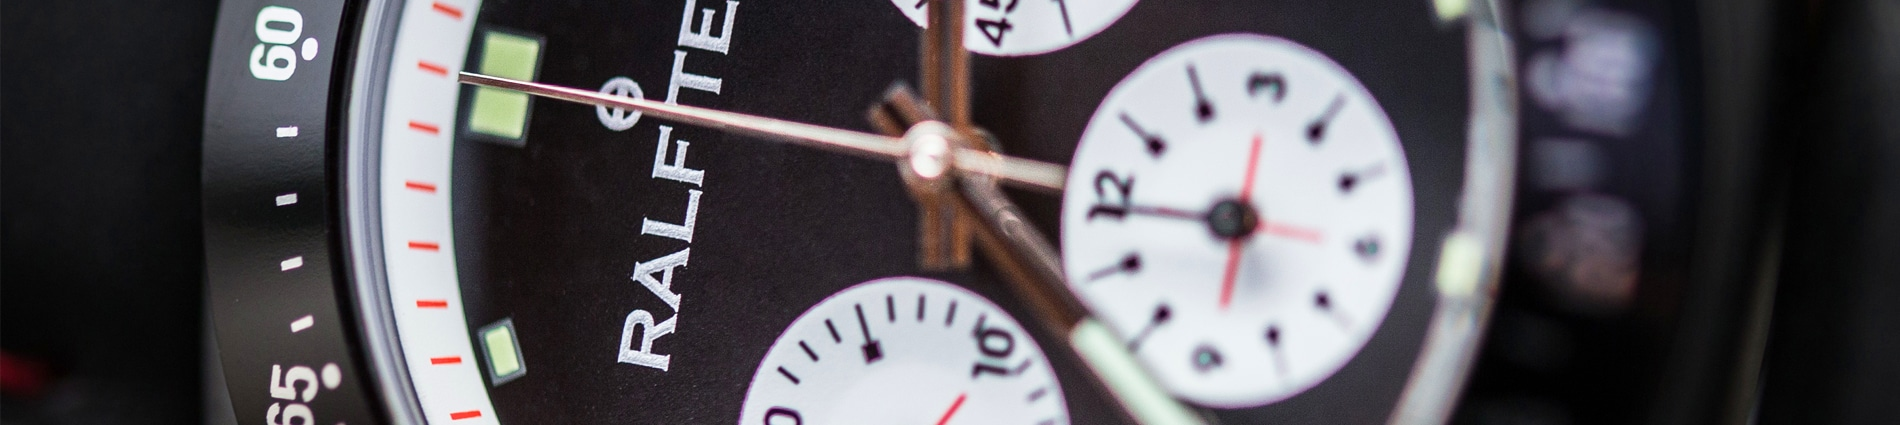 WRV  Chronographe Automatique  Tachymètre